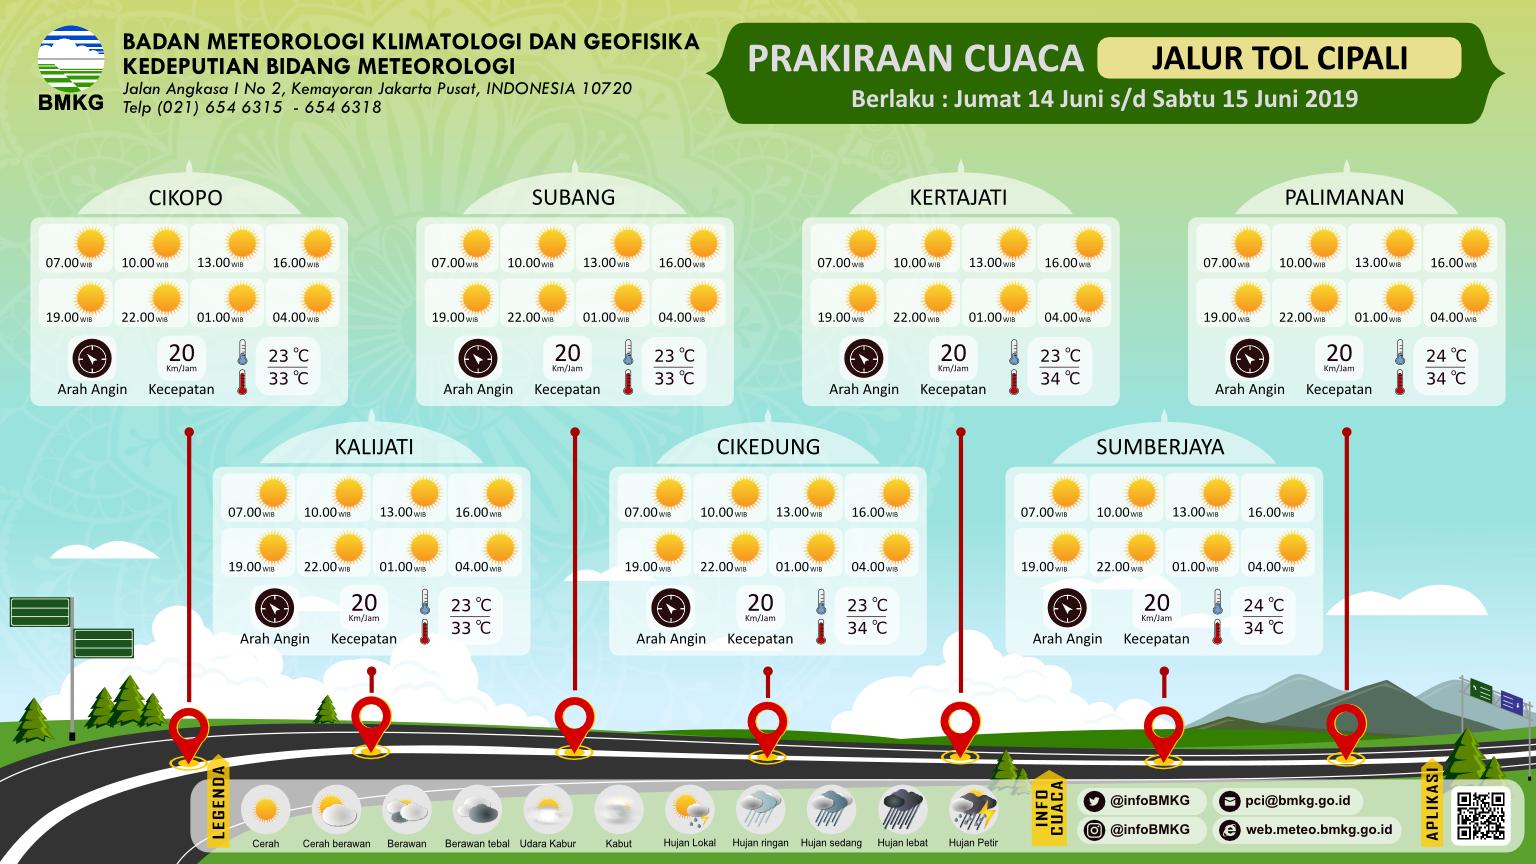 Prakiraan Cuaca Jalur Tol Cipali